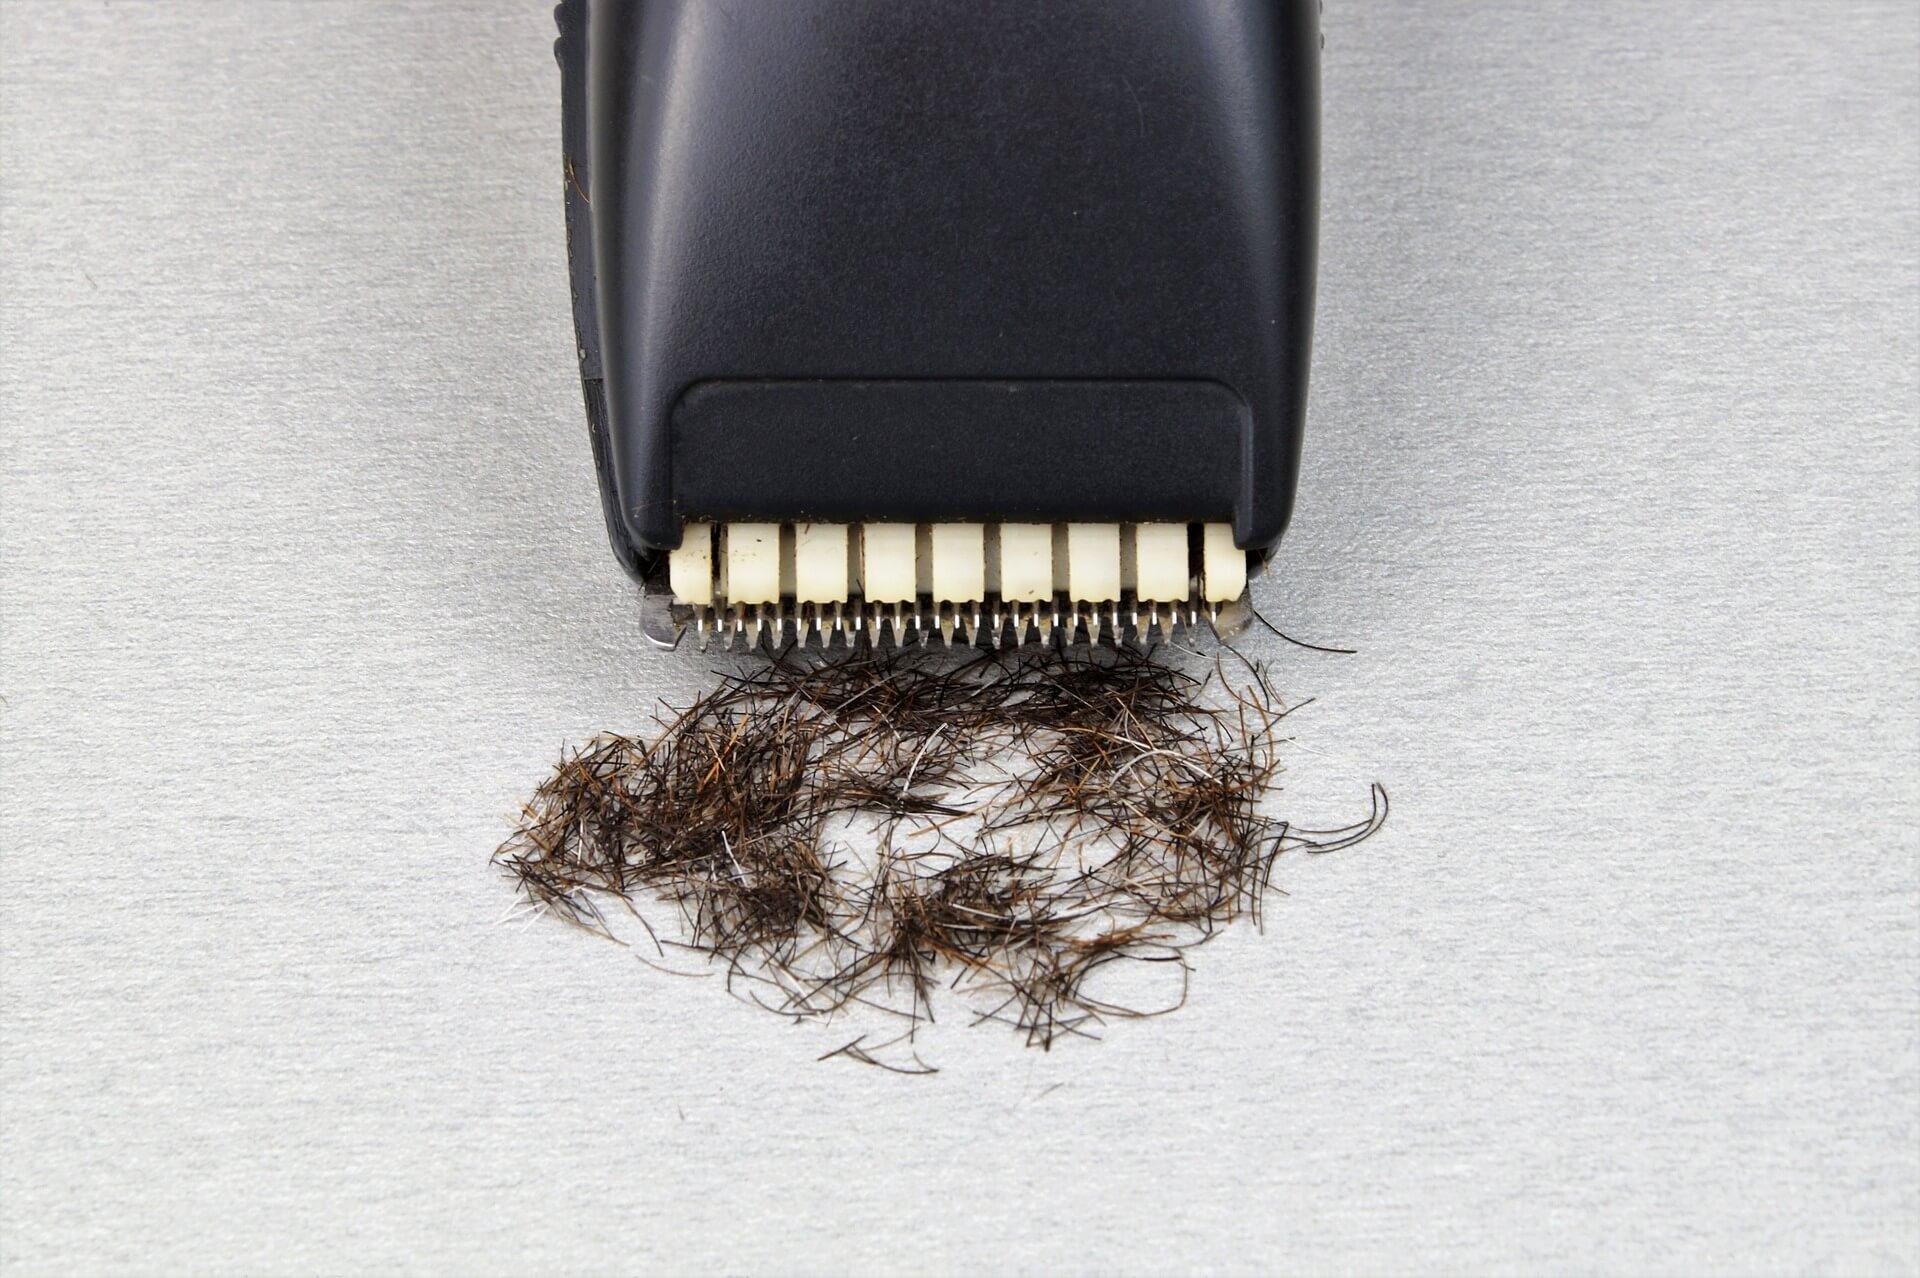 Haircut4you association